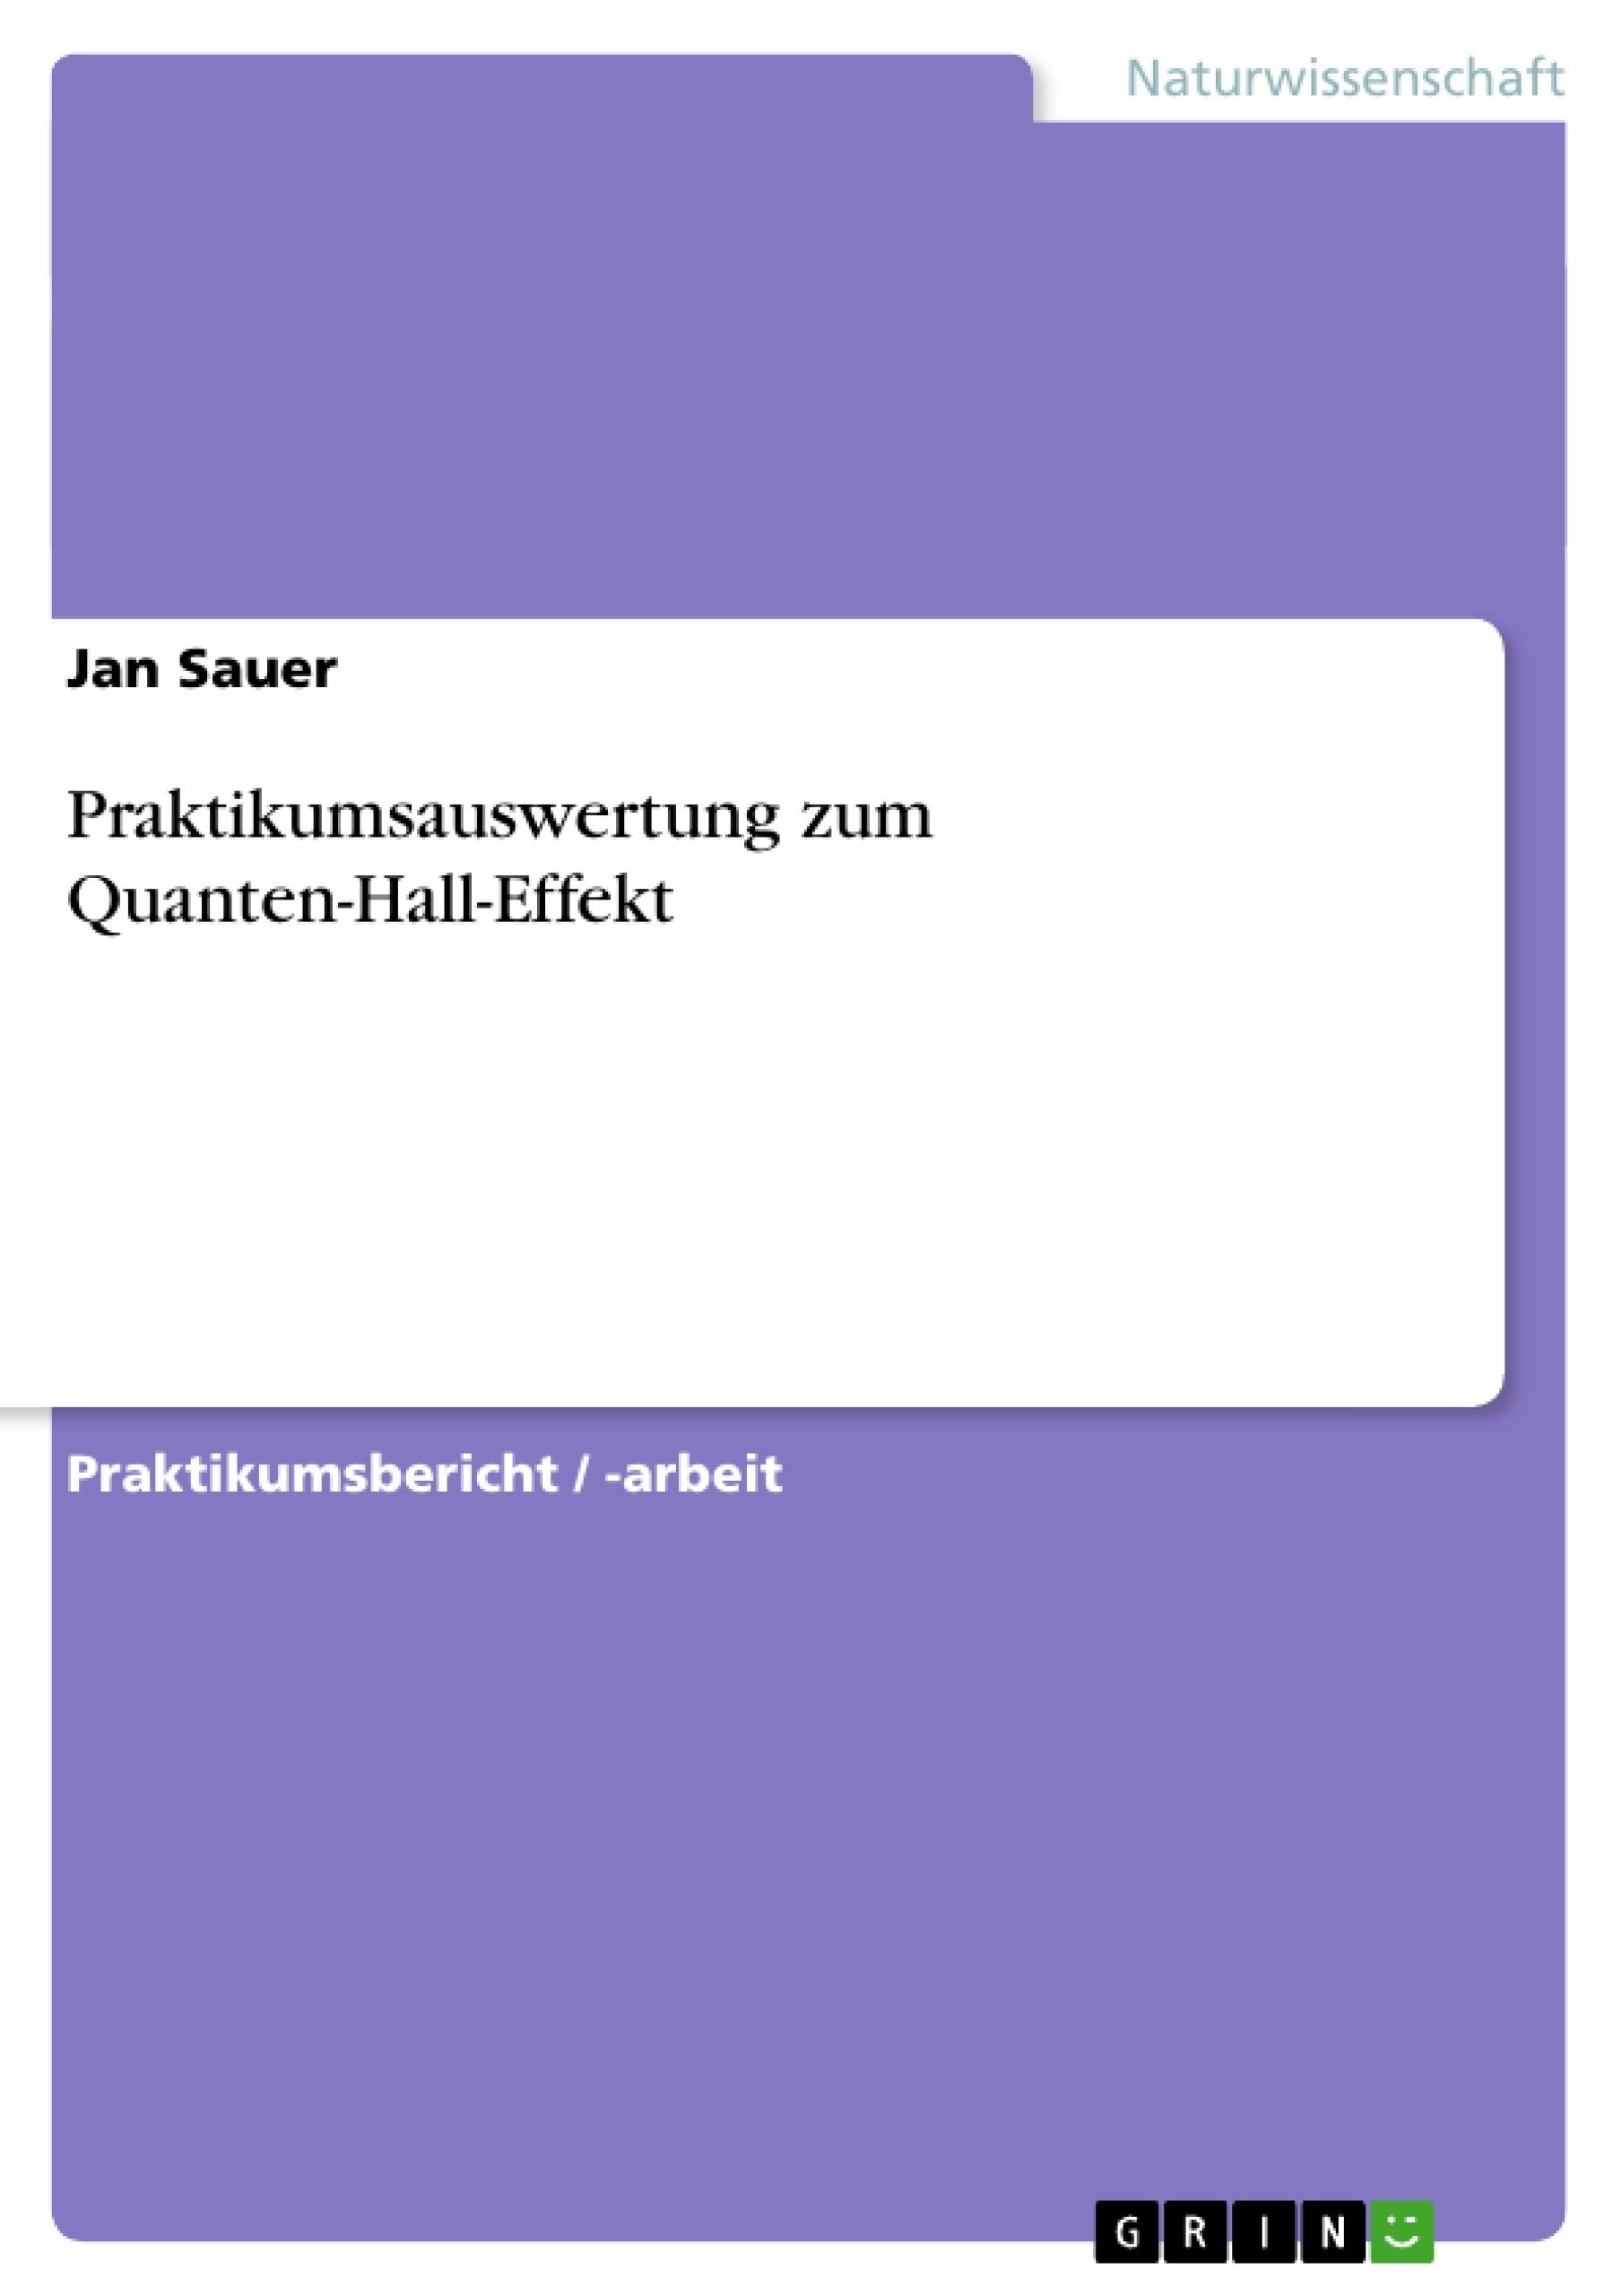 Titel: Praktikumsauswertung zum Quanten-Hall-Effekt